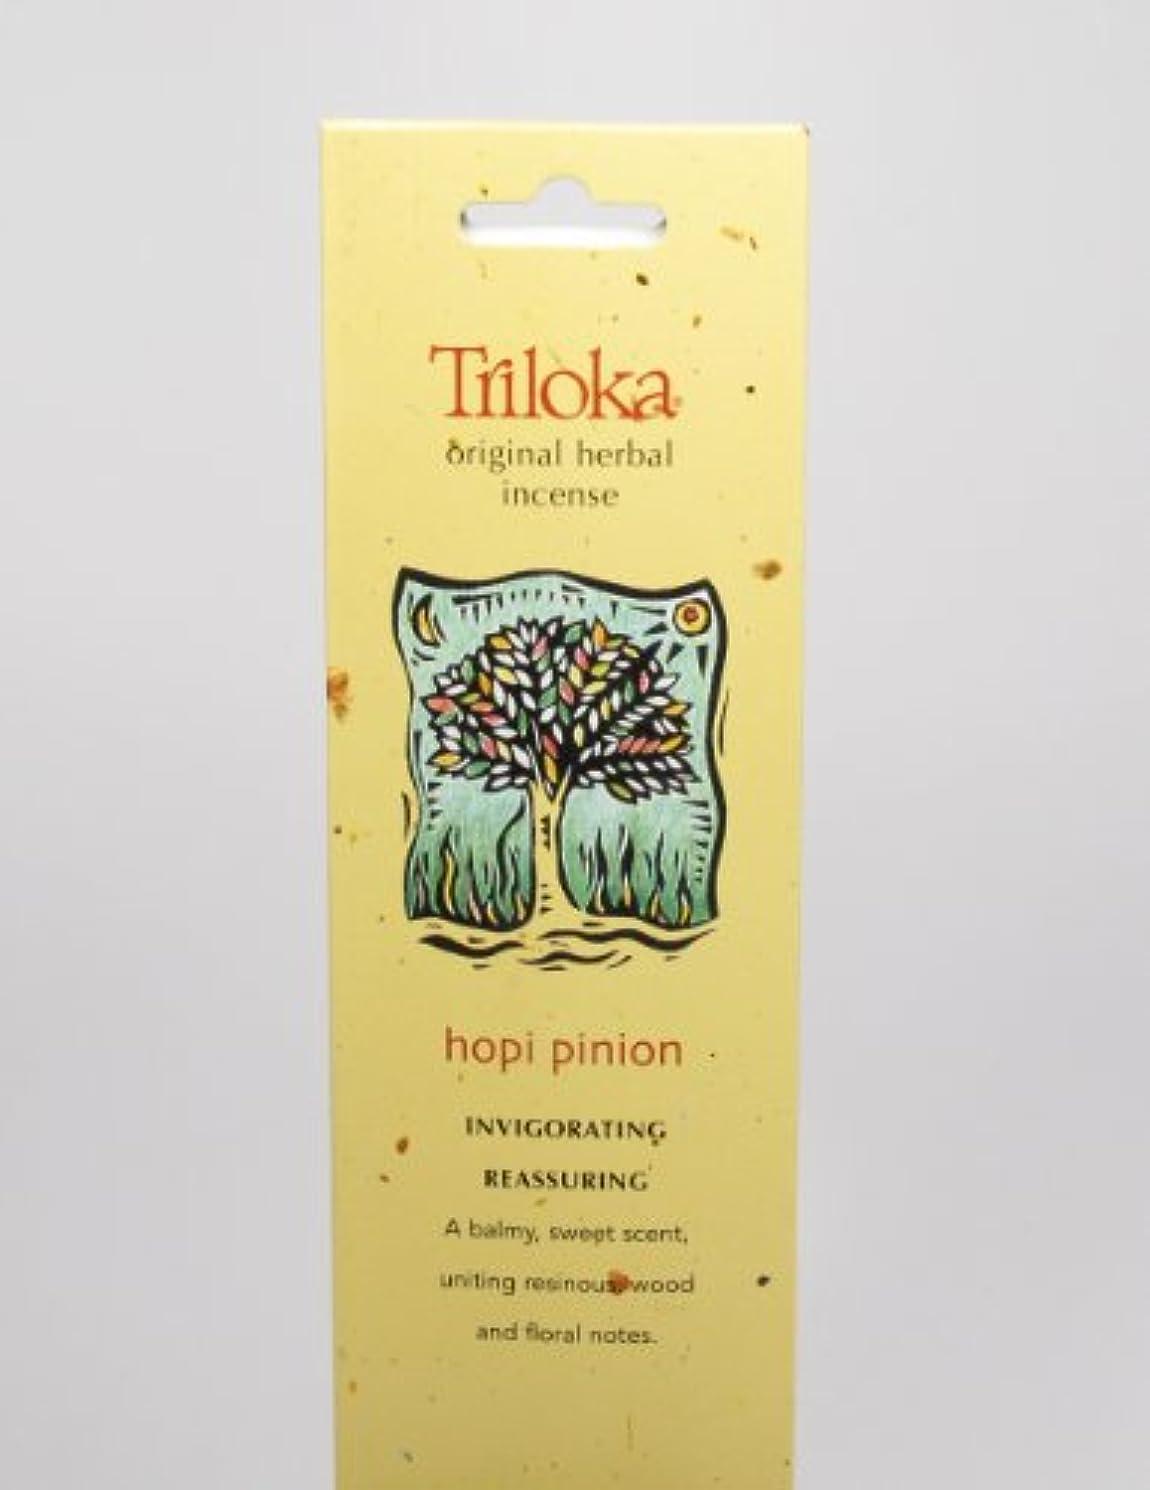 昼寝治世記念品Hopi Pinon – Triloka元Herbal Incense Sticks